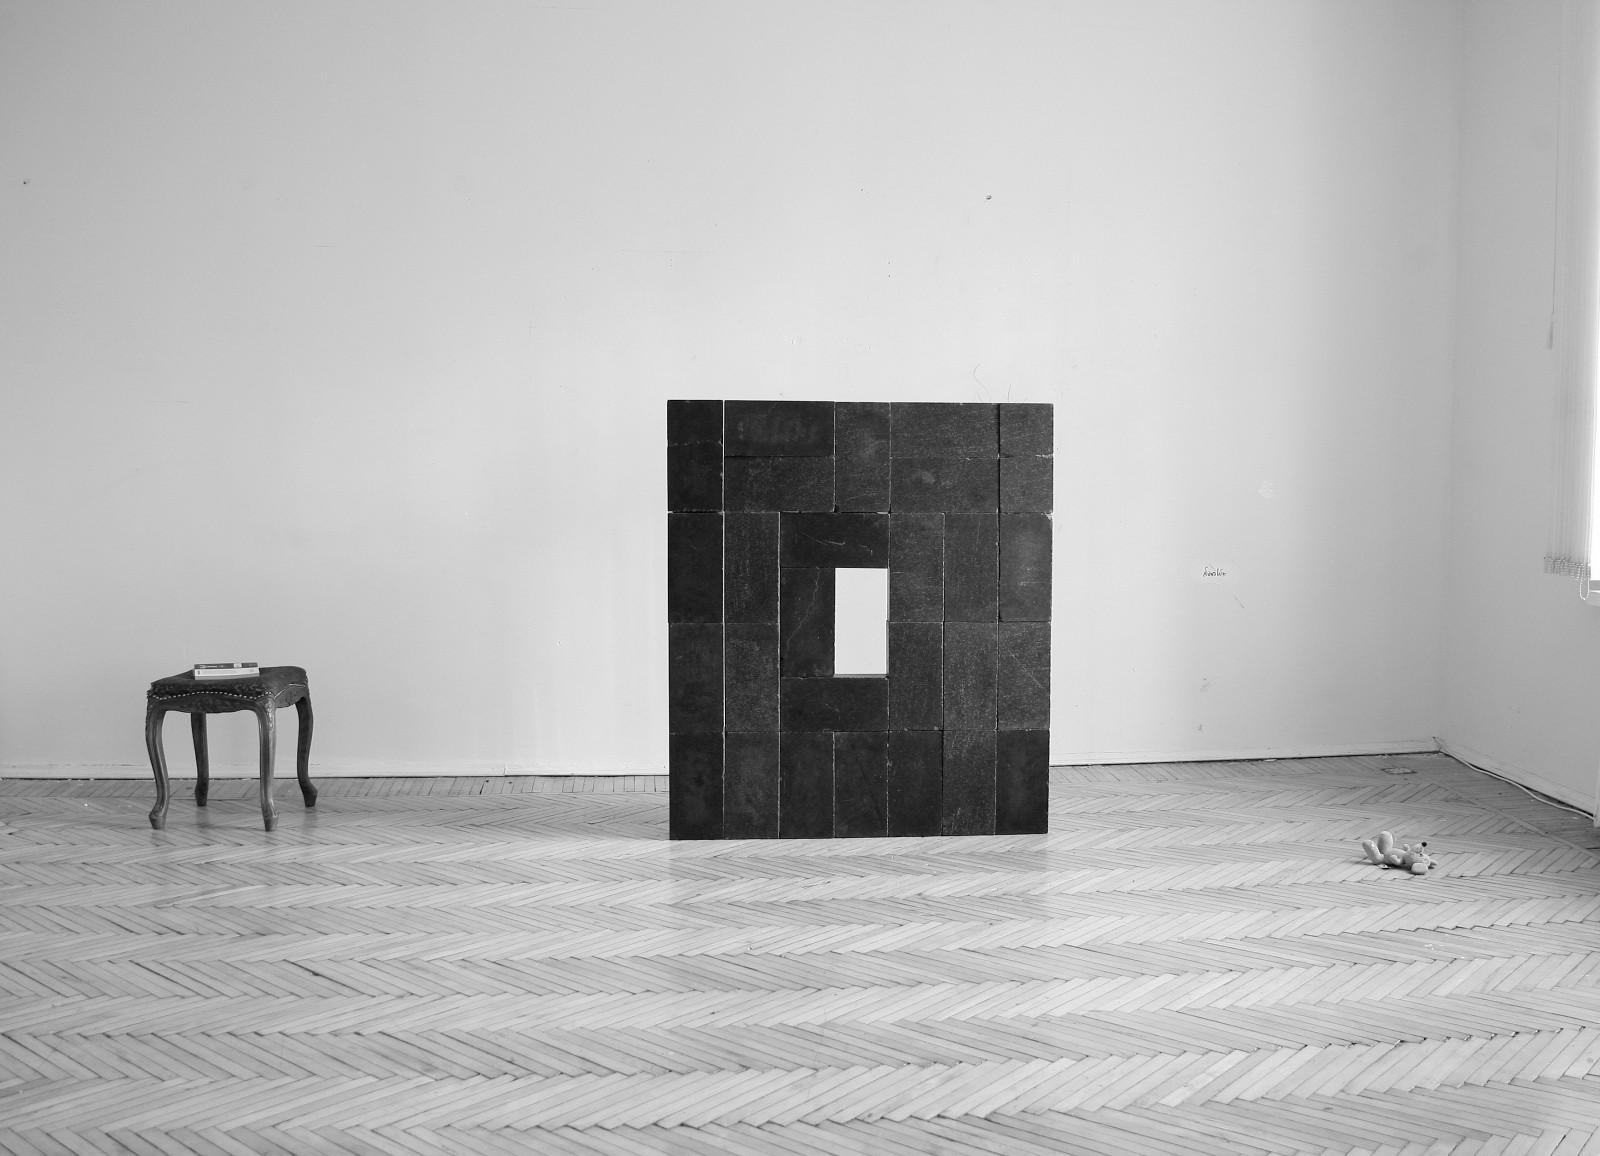 Hintergrundbilder bw kunst skulptur skulpturen for Minimal art kunst